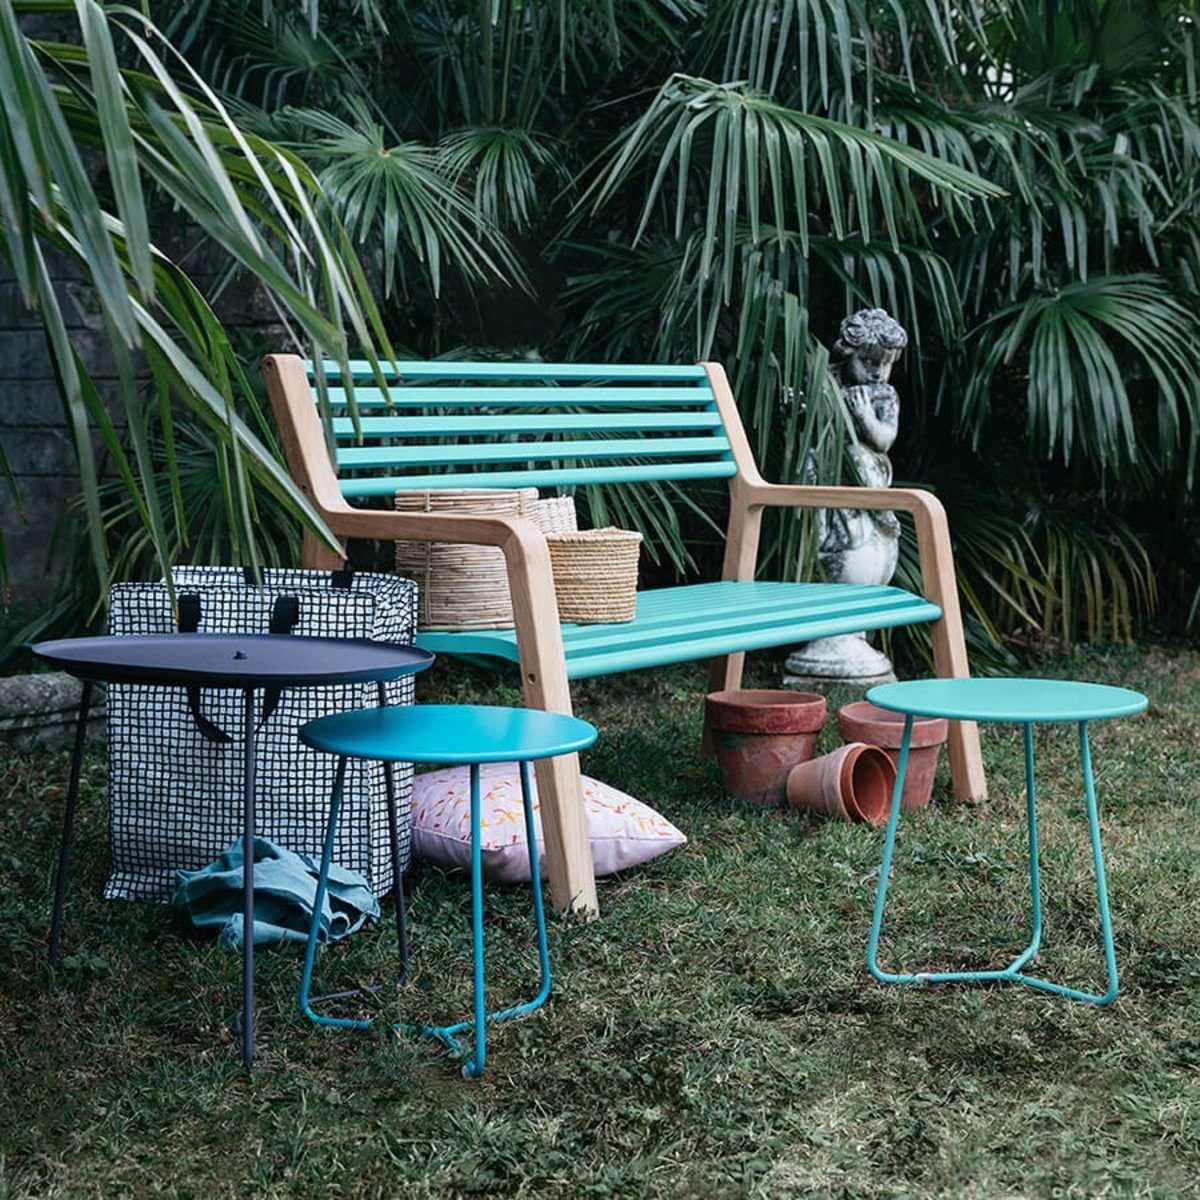 Pin On Sirohi Product Shots Regarding Cavin Garden Benches (View 15 of 25)